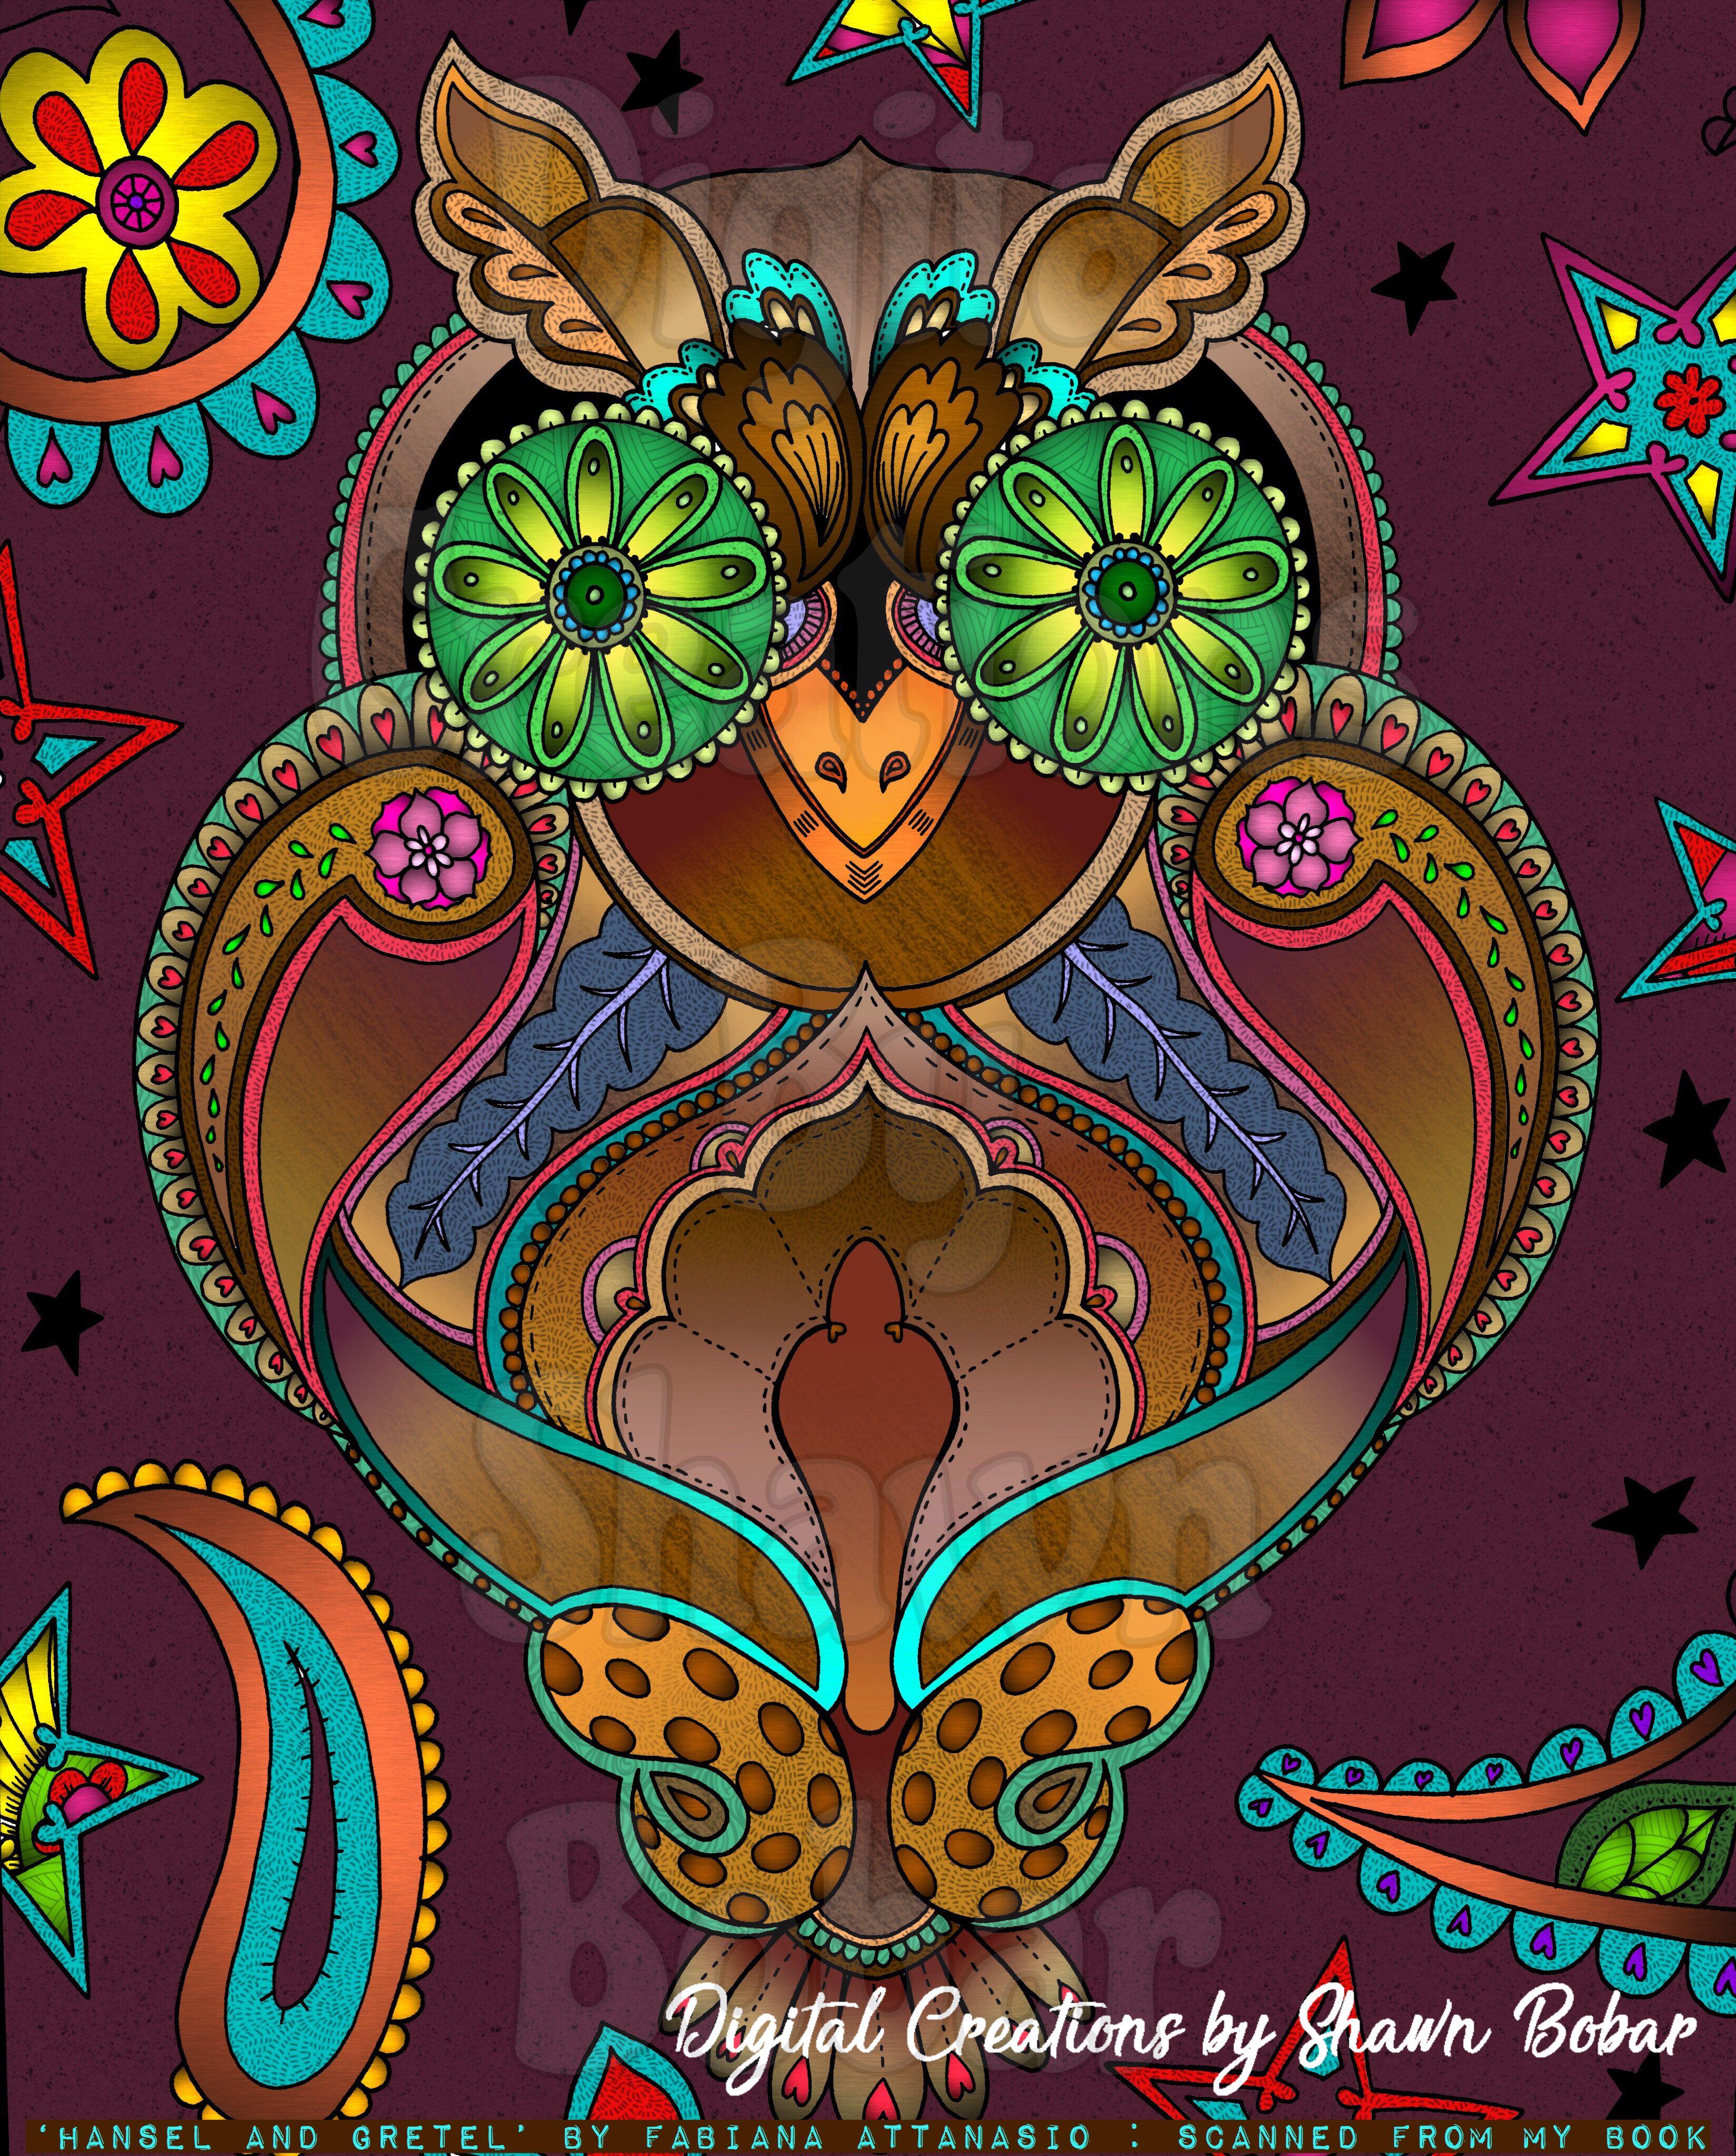 Artist Fabiana Attanasio Hansel And Gretel Digitally Colored Using Pigment IPad Pro Apple